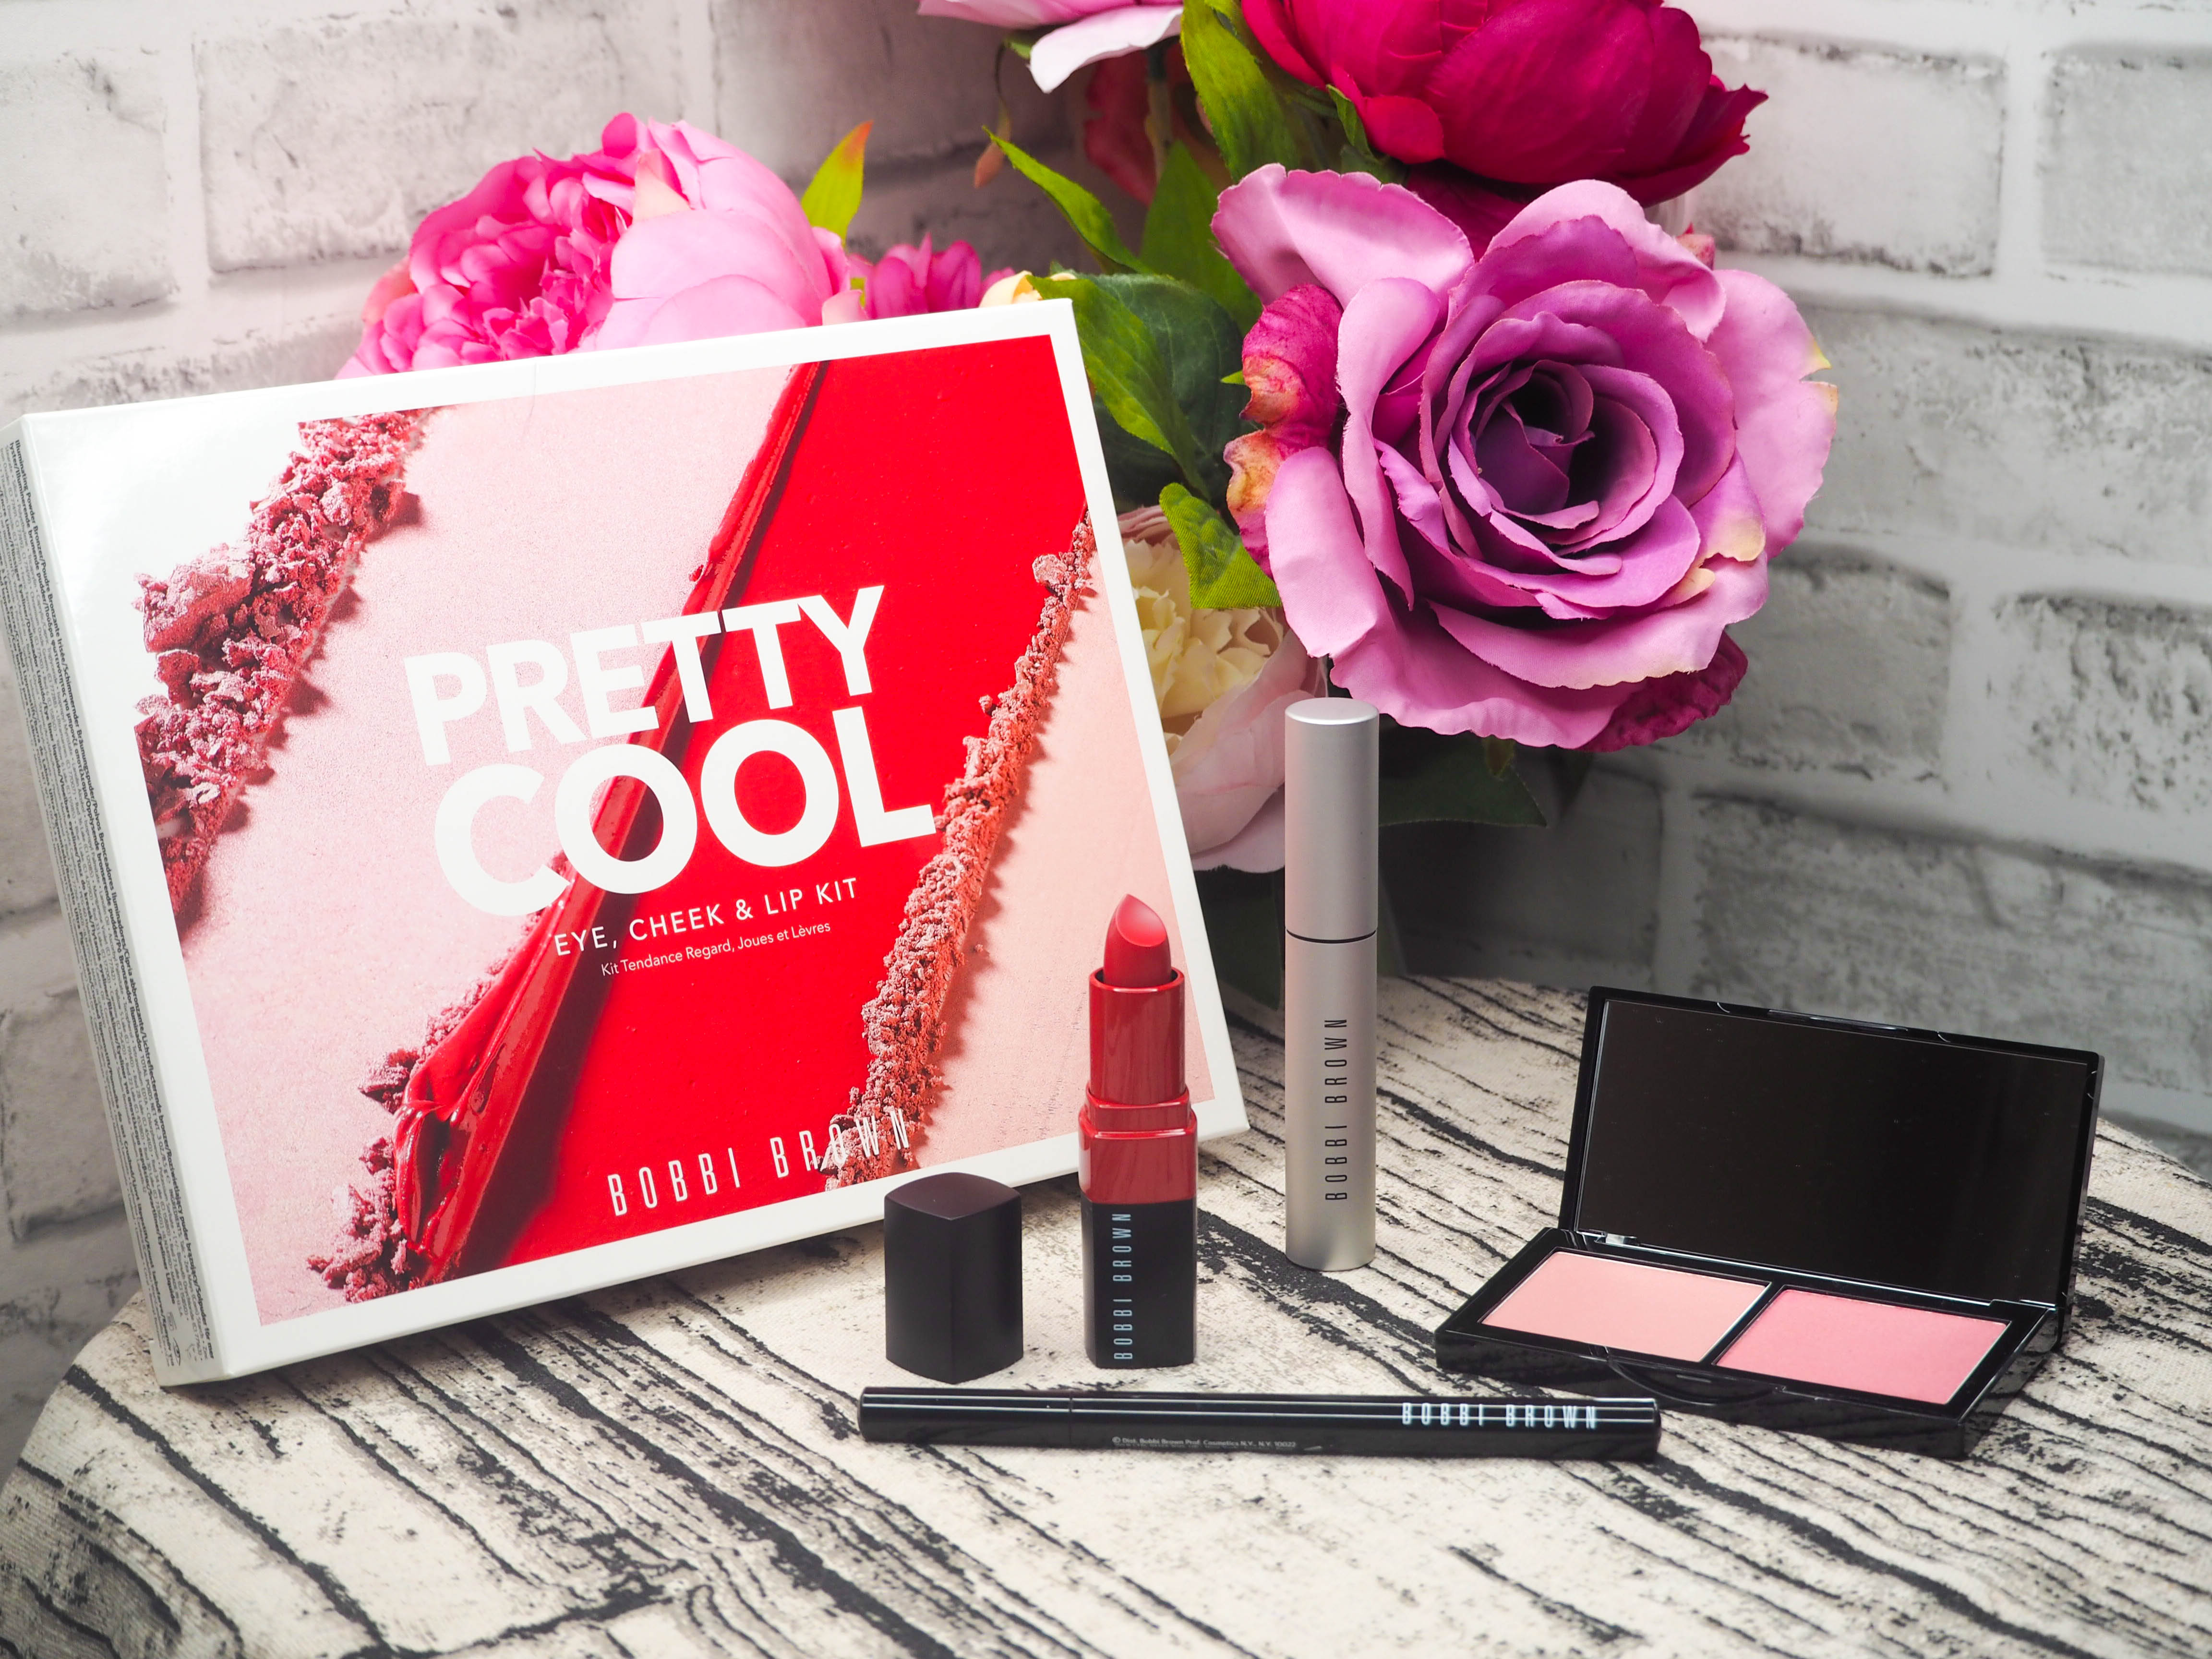 Bobbi Brown 4 Piece Pretty Cool Eye, Cheek and Lip Collection